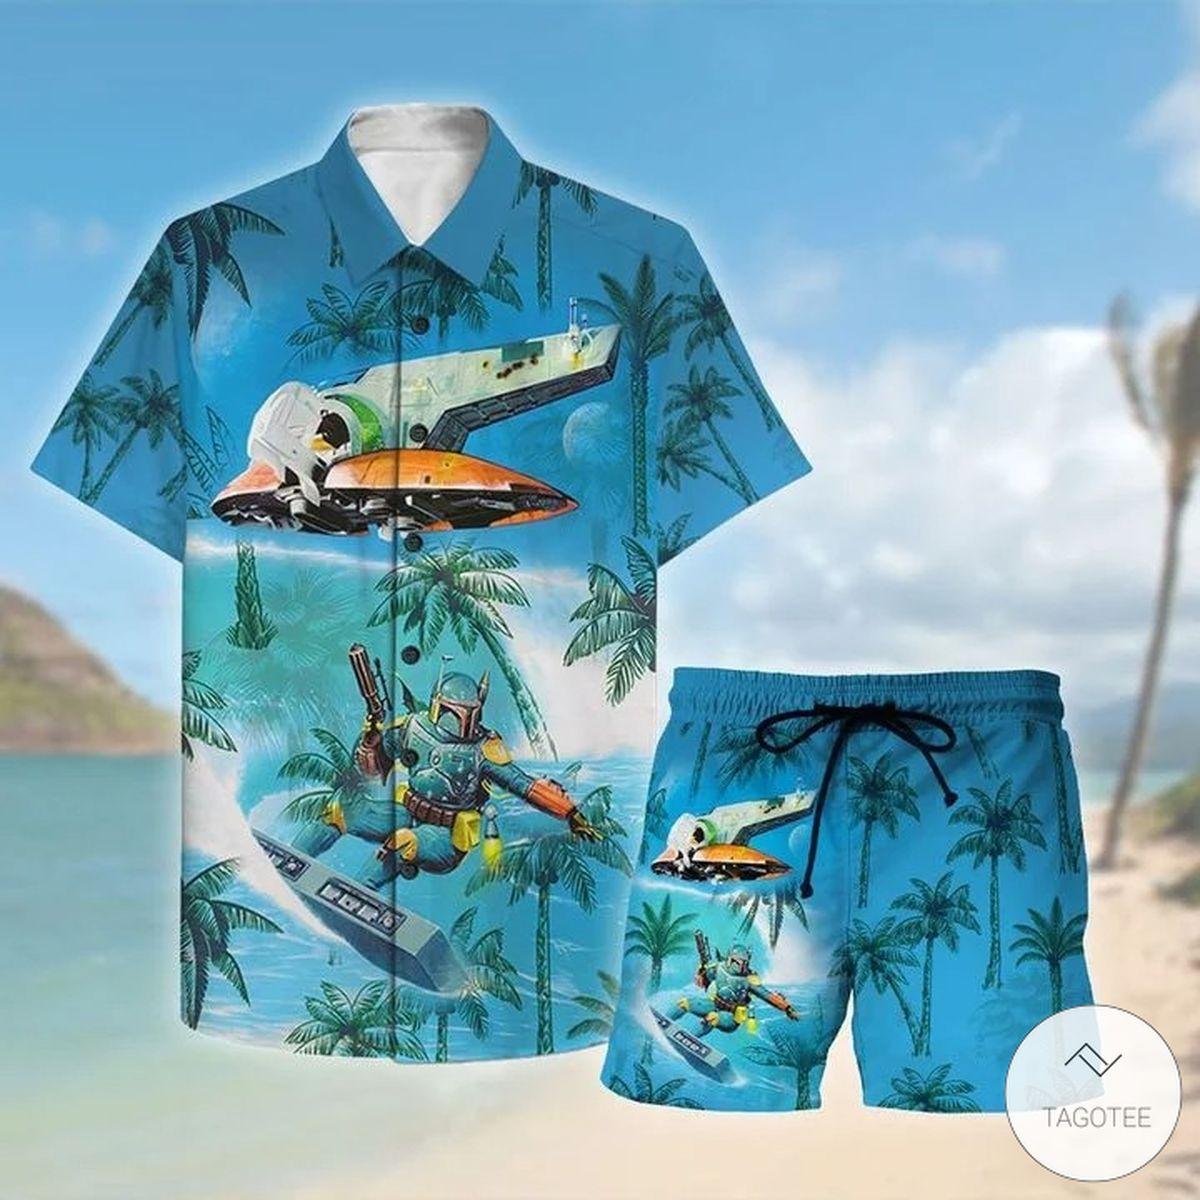 Wonderful Mandalorian Surfing Hawaiian Shirt, Beach Shorts